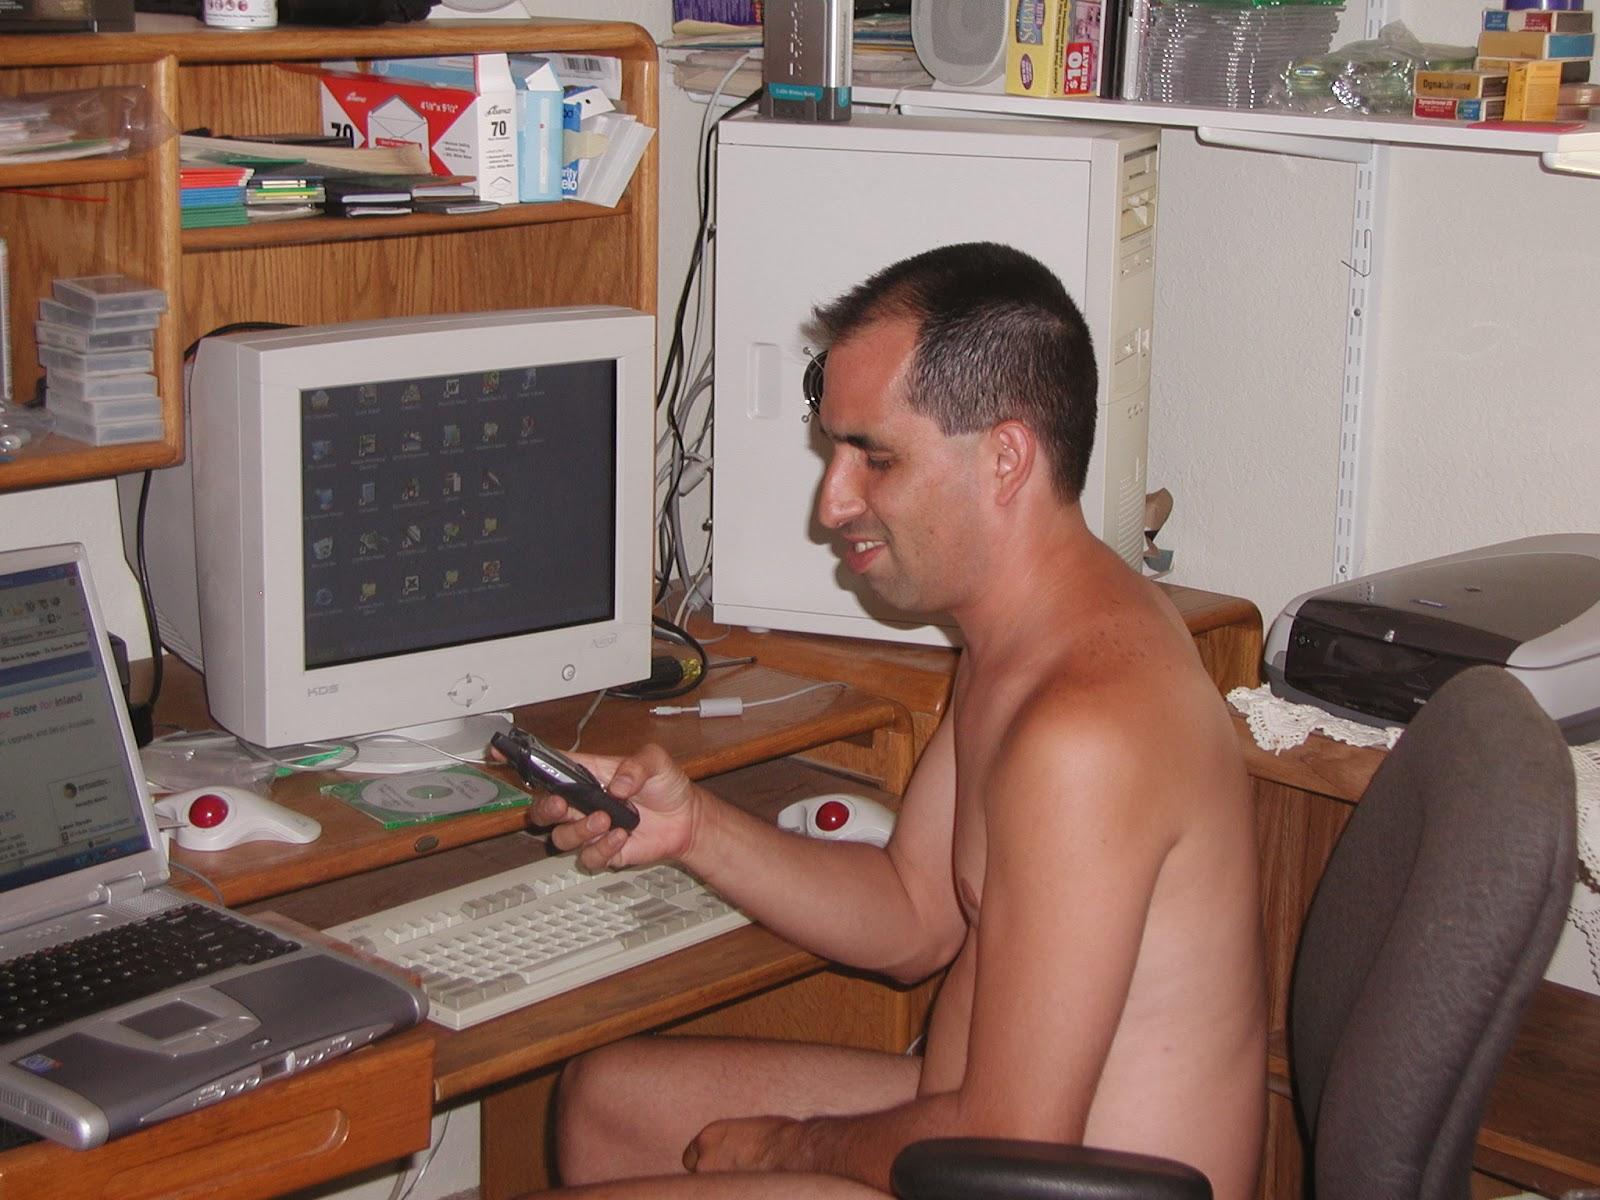 nudists porn